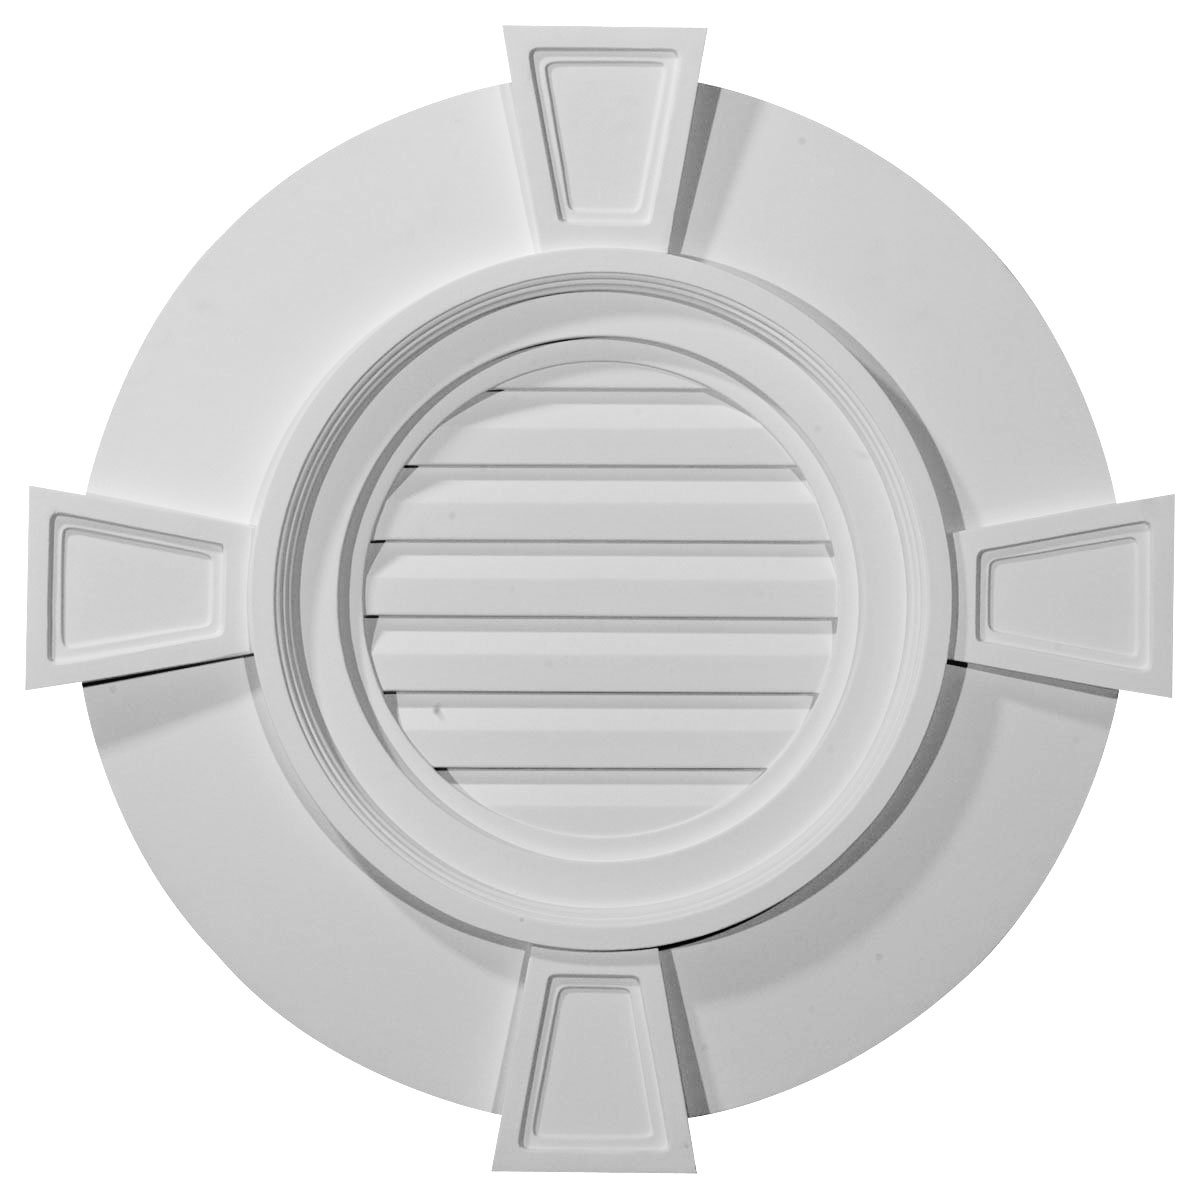 Ekena Millwork GVRO24TDK 24-Inch W x 24-Inch H x 1 1/2-Inch P Round Gable Vent with Keystones, Decorative